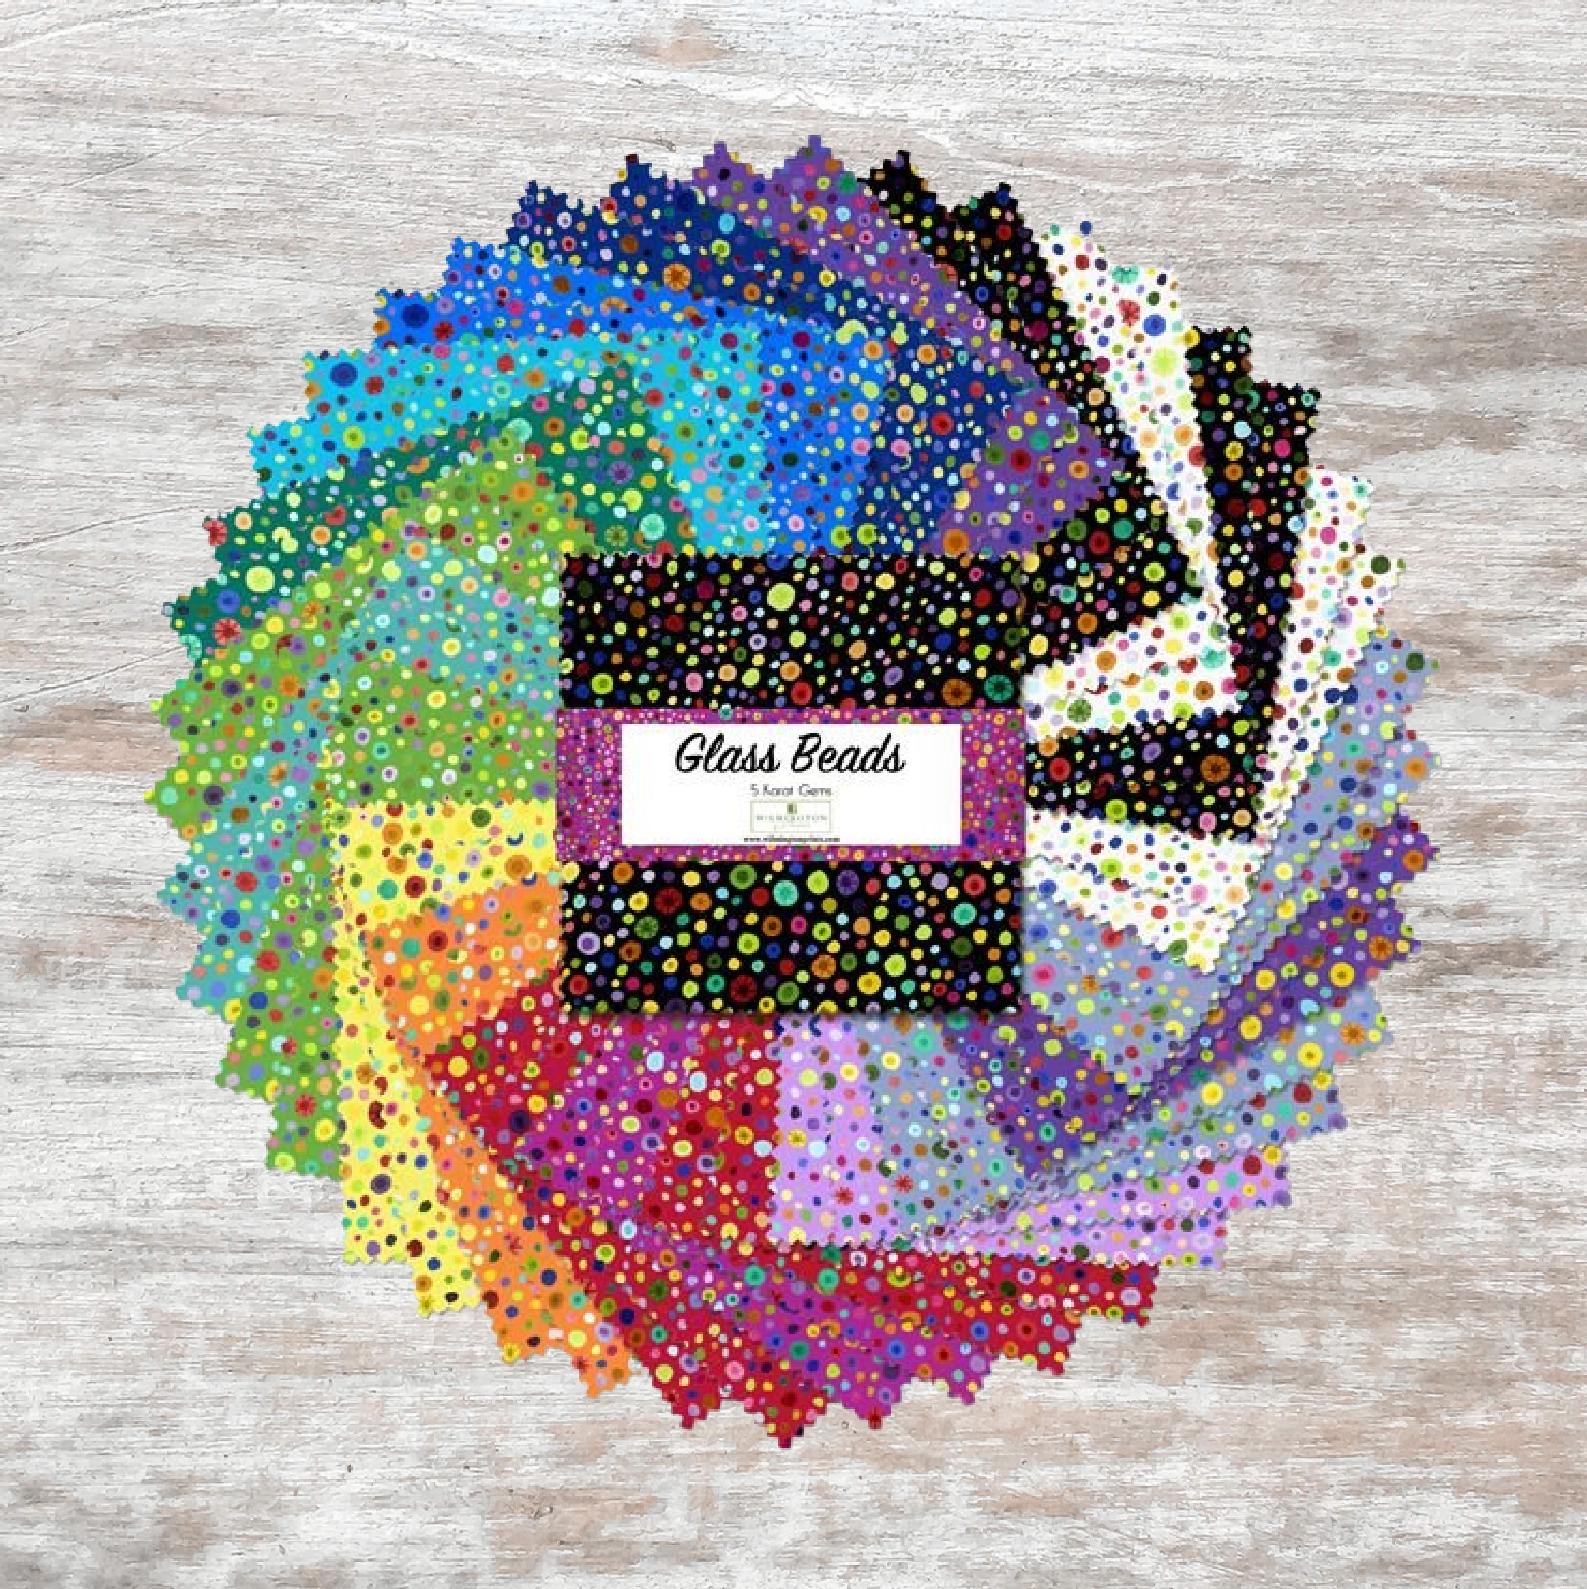 Essentials Glass Beads 10 Karat Gems 10 Squares (42 pcs)